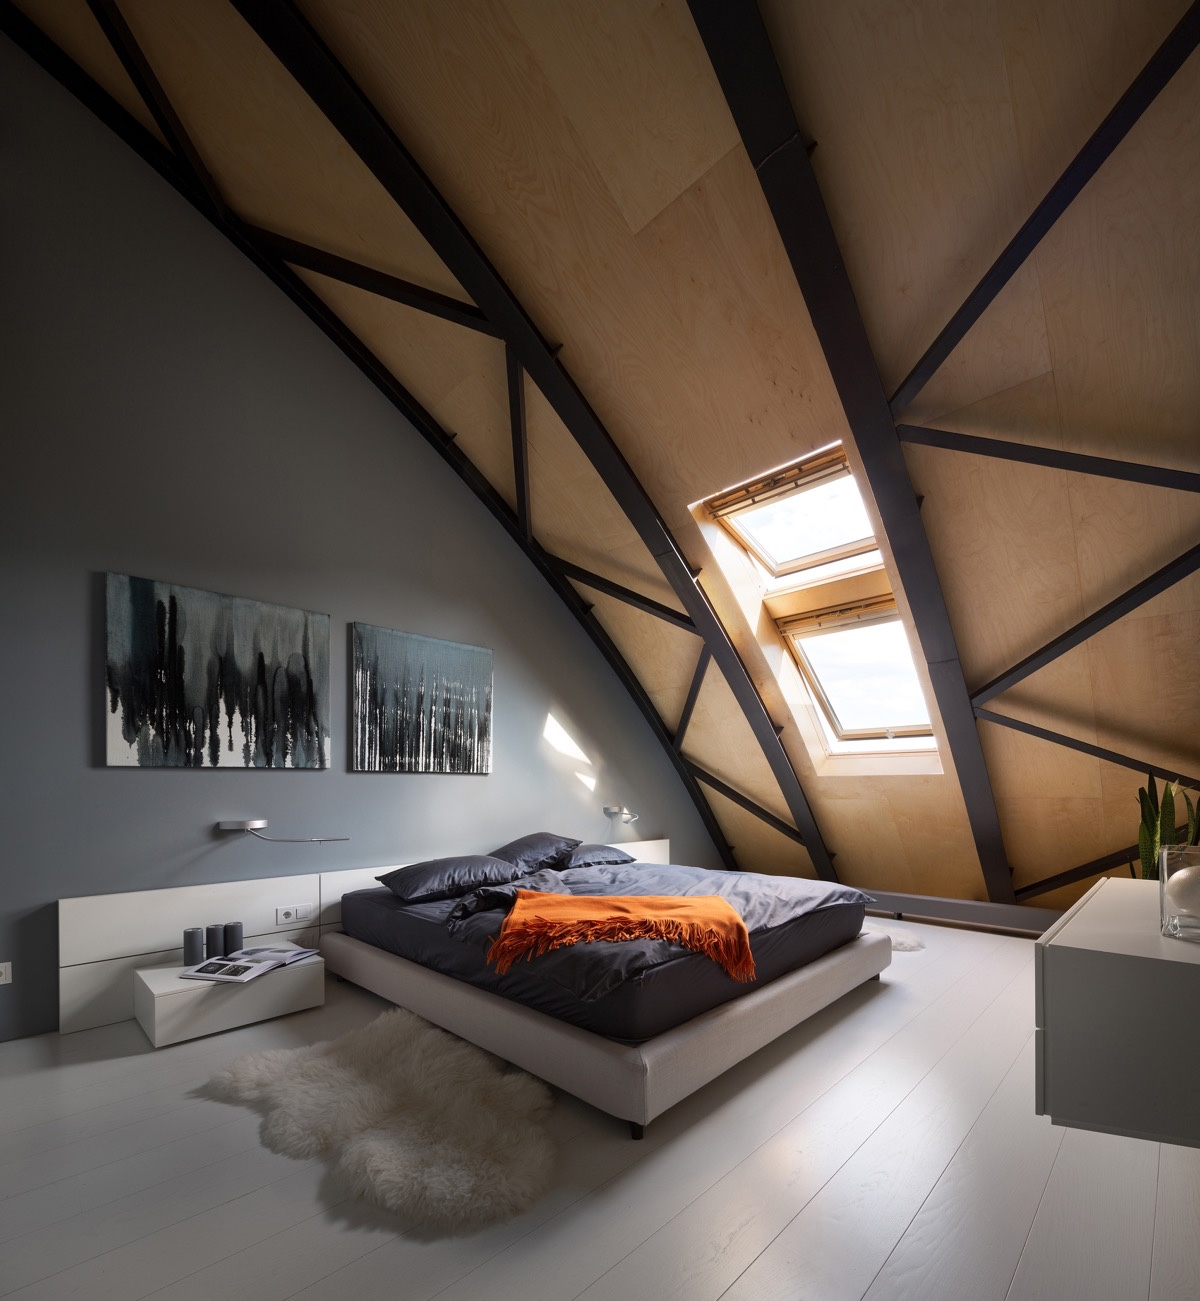 Desain Kamar Tidur Loteng Yang Menakjubkan